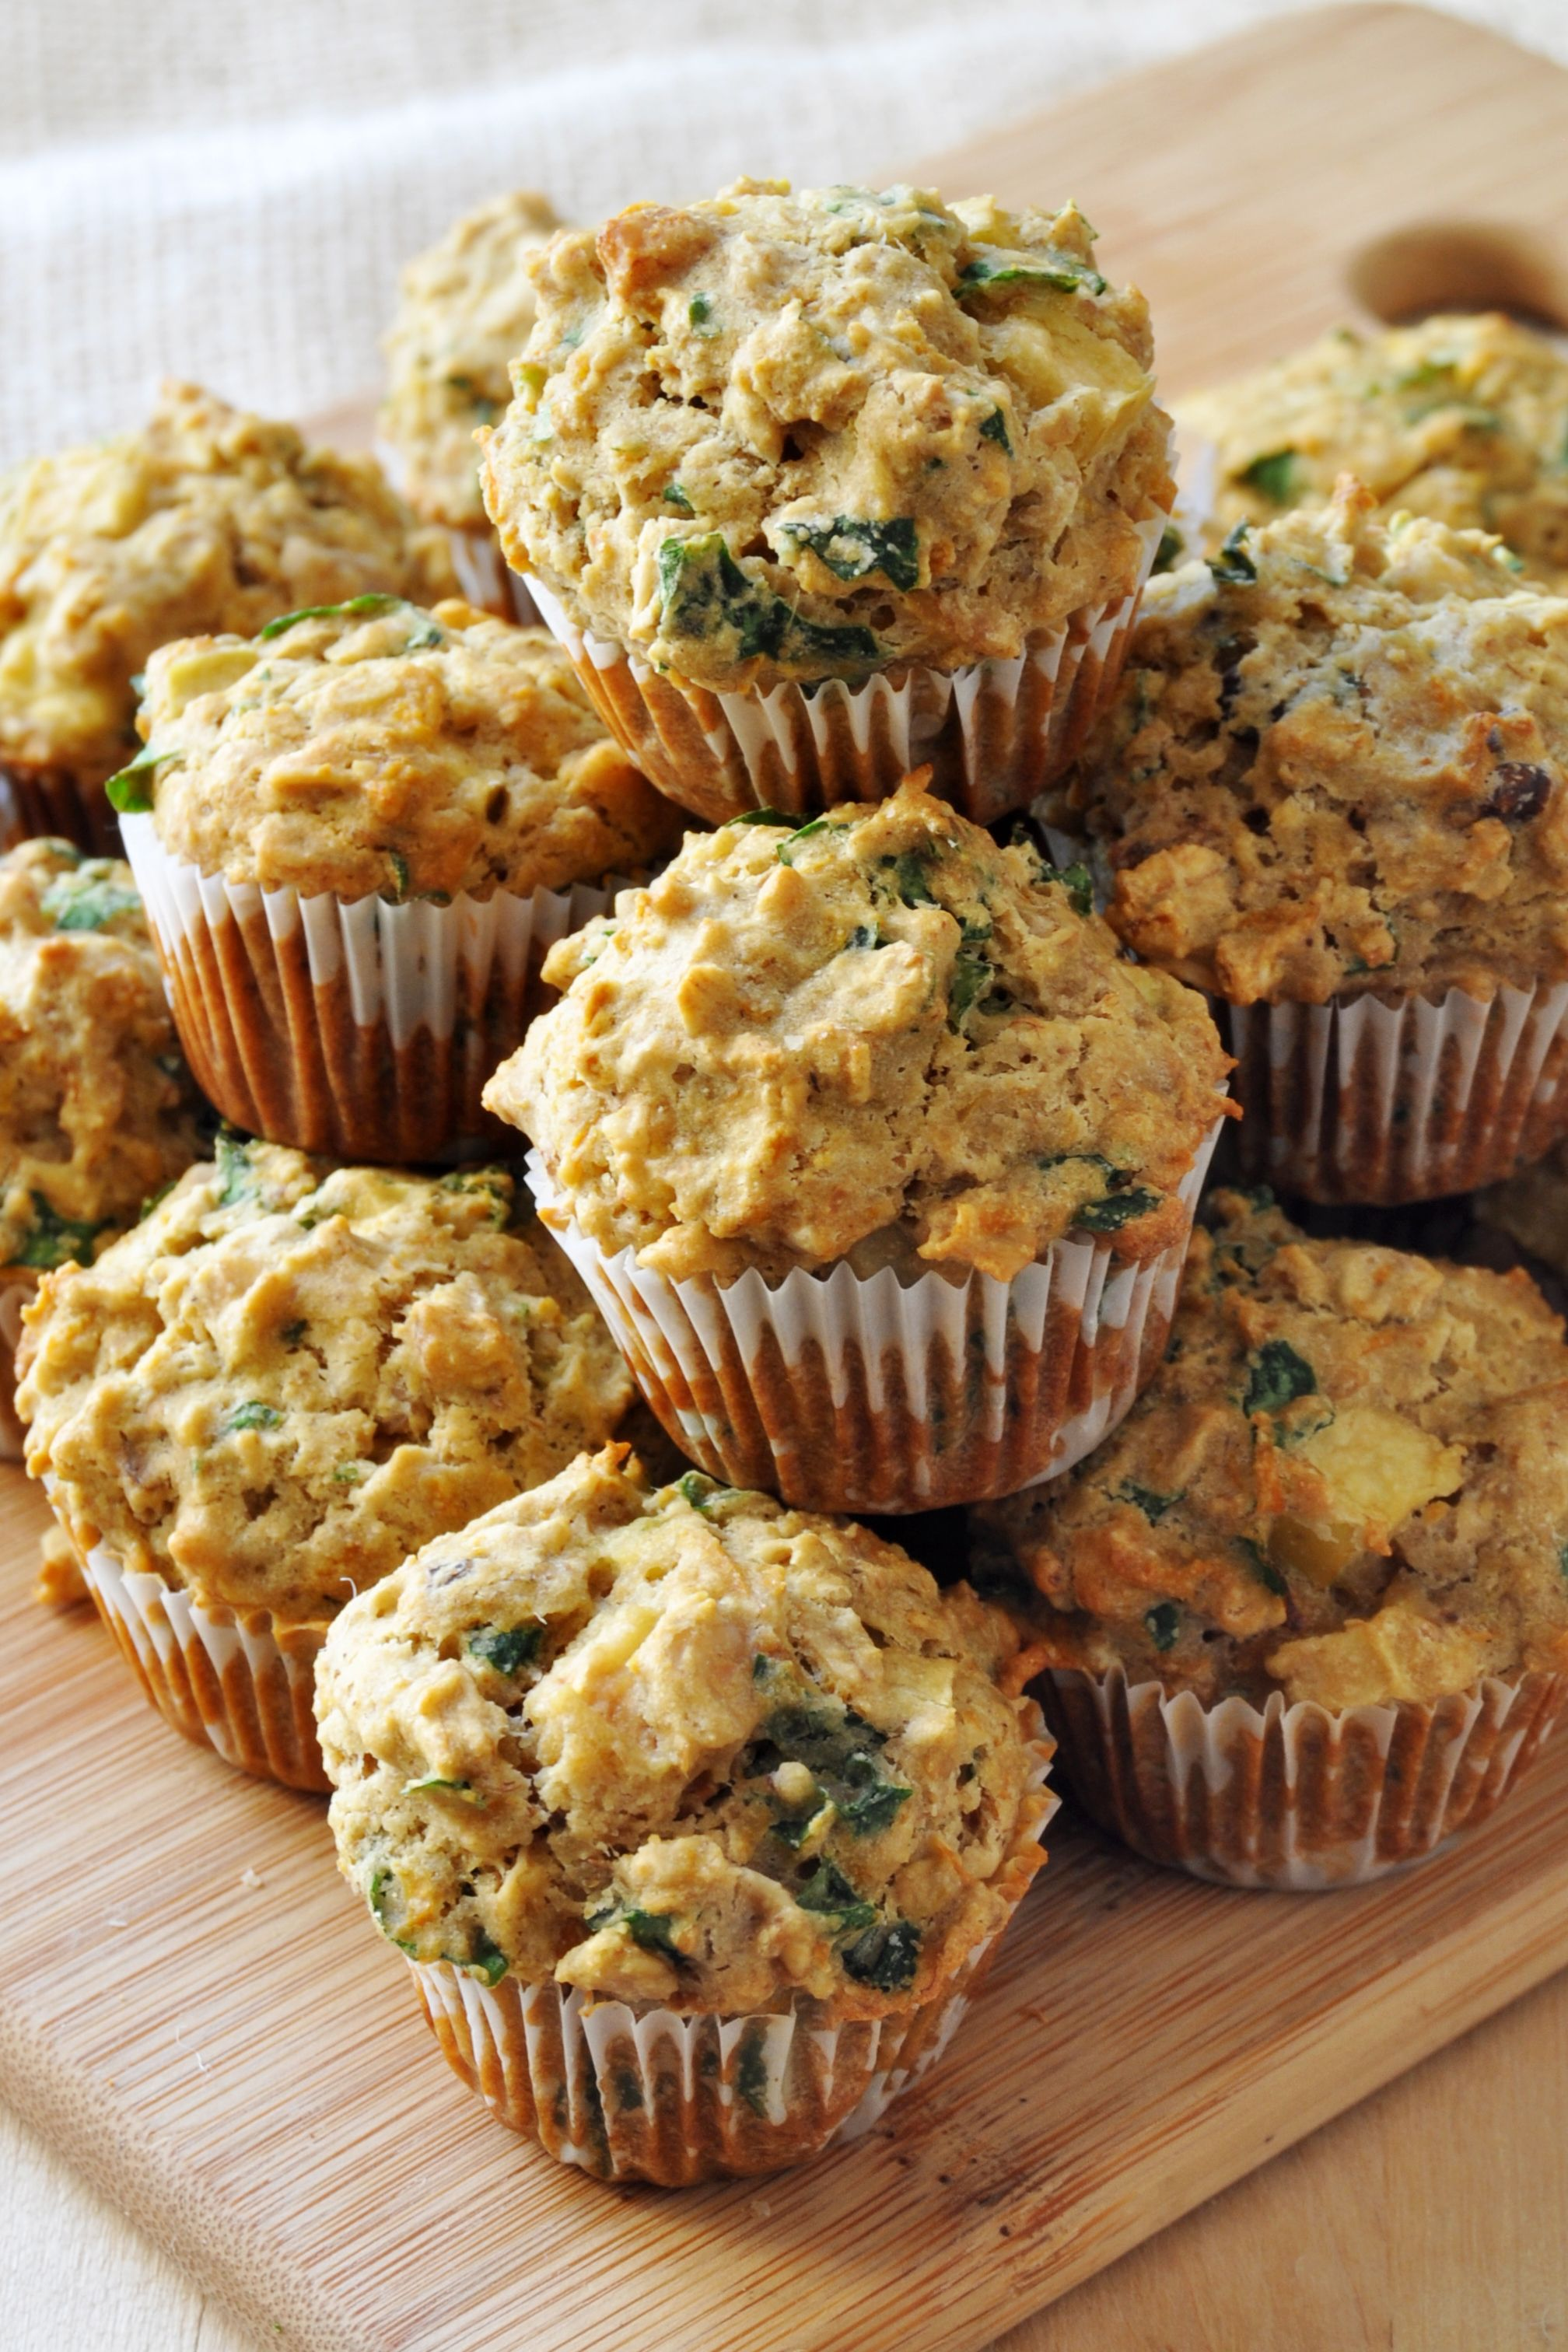 Fruit And Veggie Mini Muffins Vegan Gluten Free The Colorful Kitchen Recipe Veggie Muffins Gluten Free Milk Baby Food Recipes